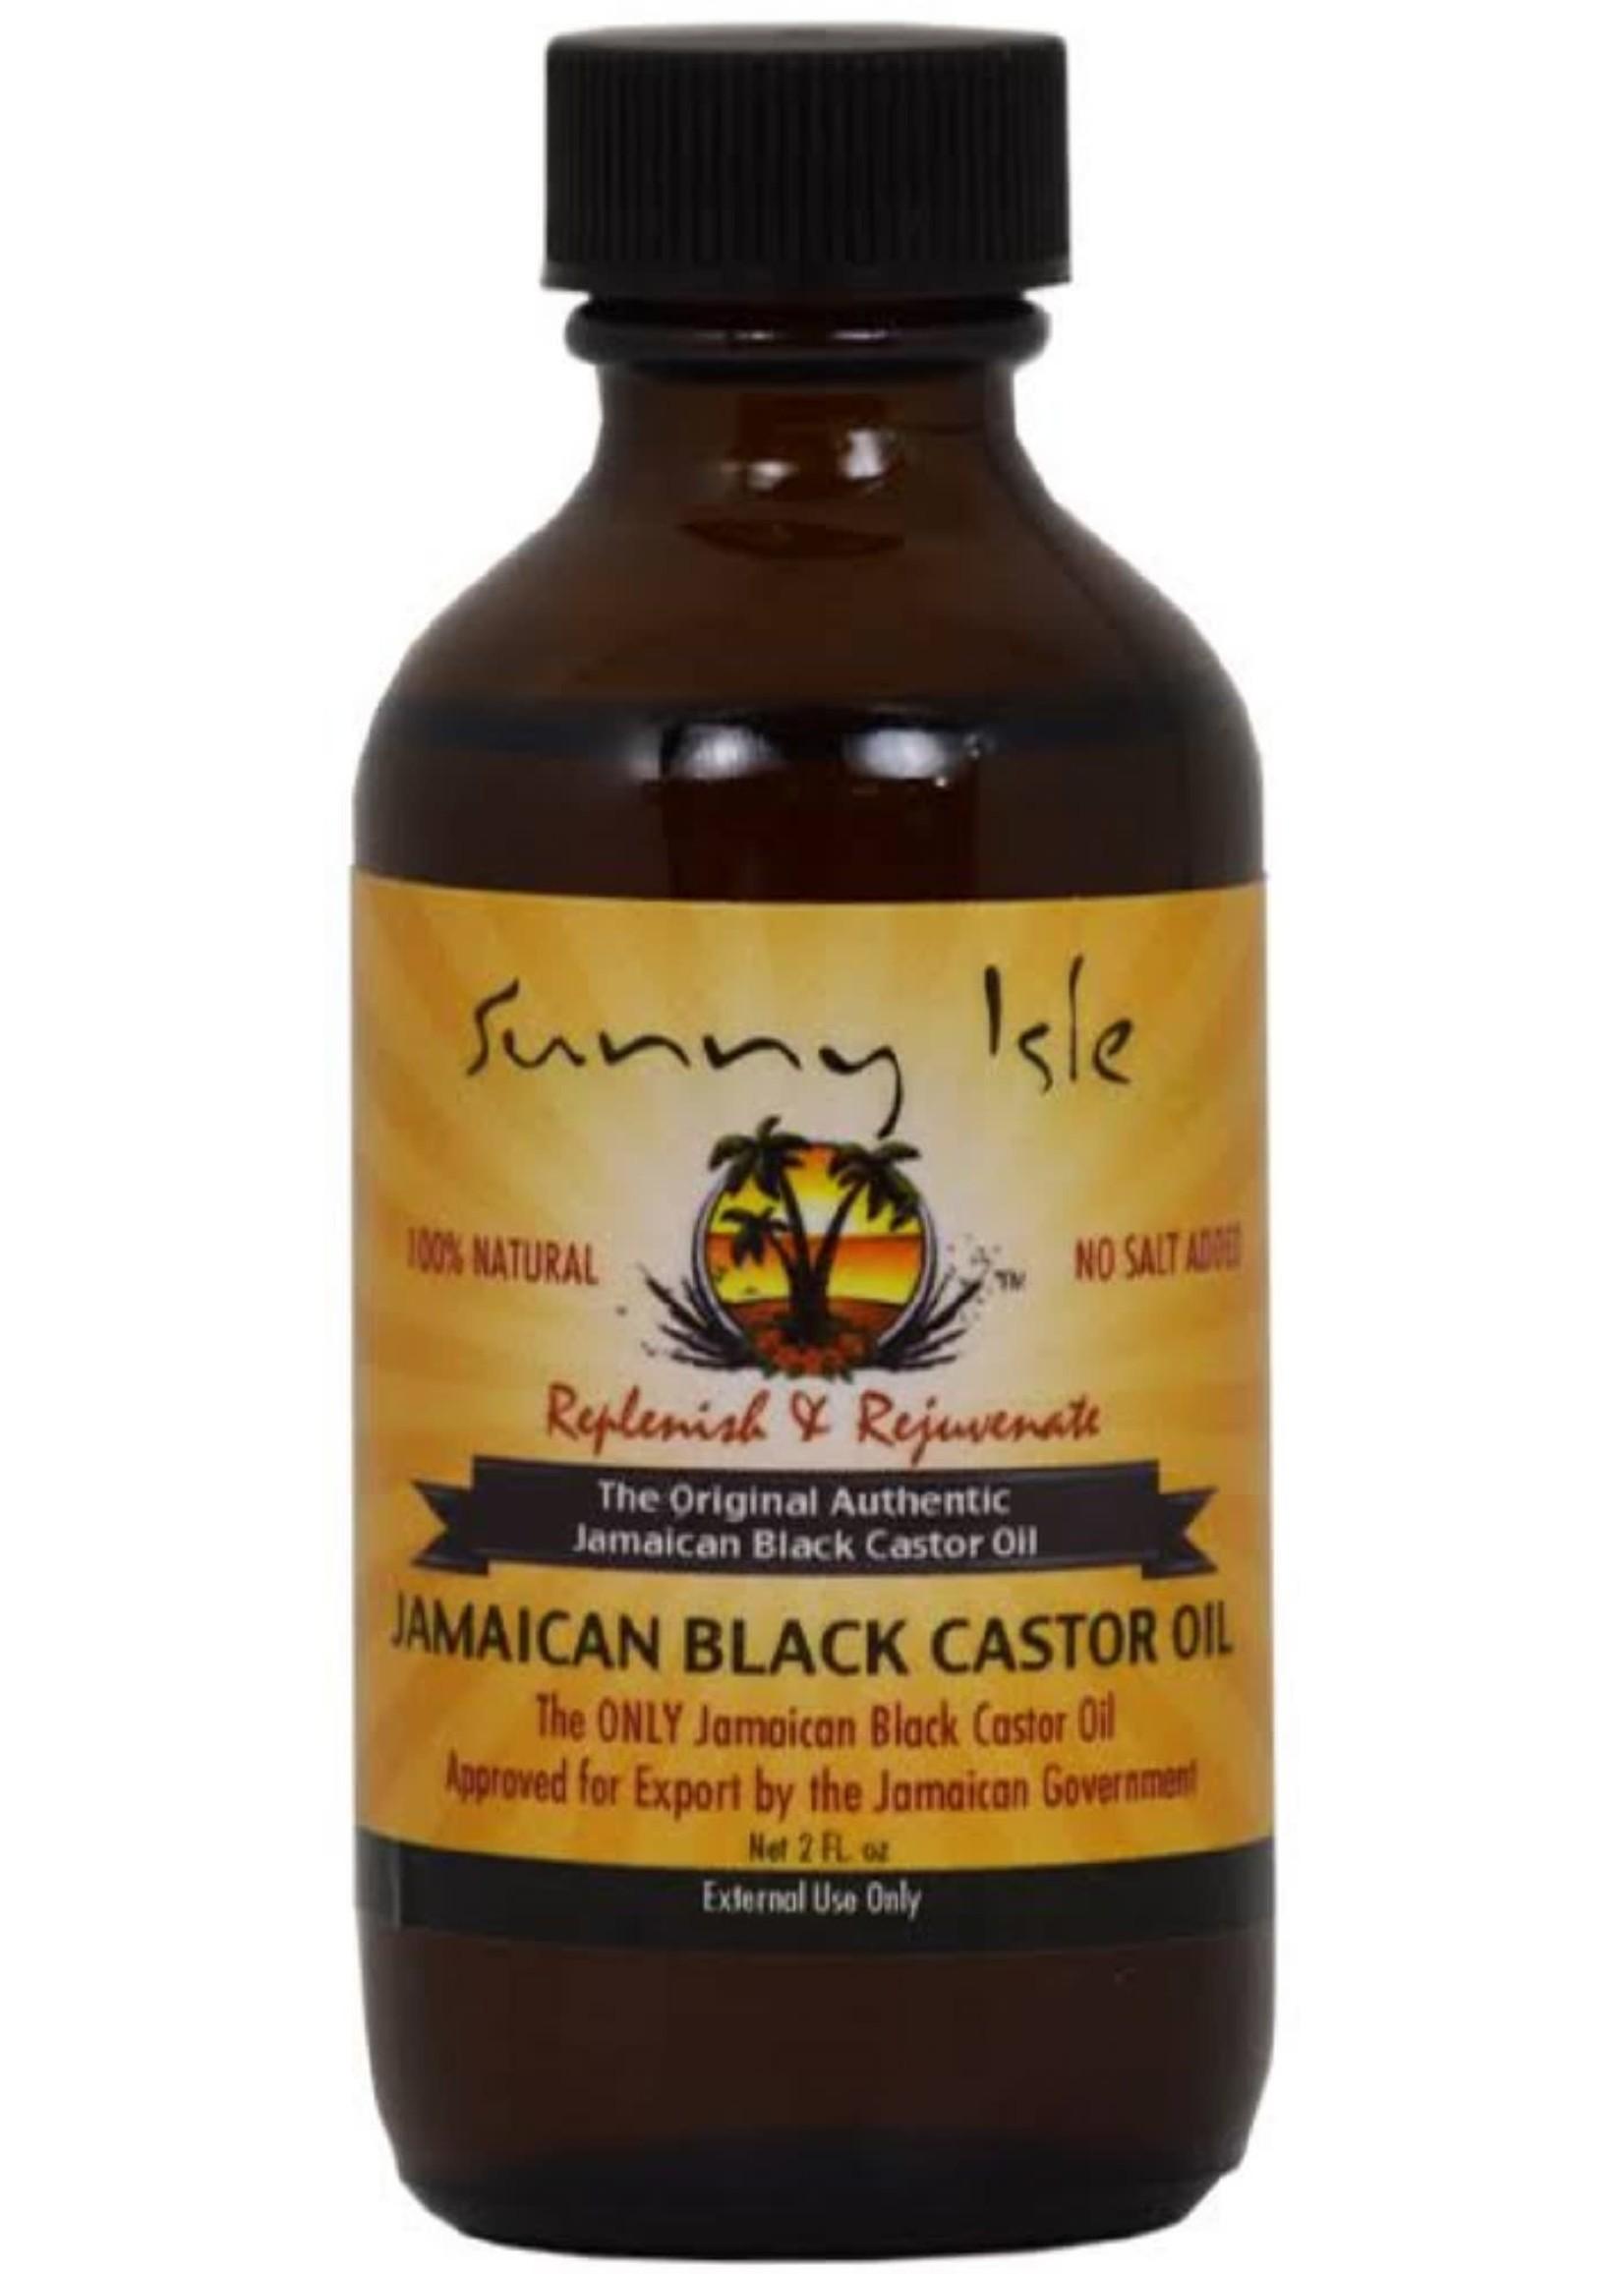 Jamaican Black Castor Oil 100% Pure & Natural